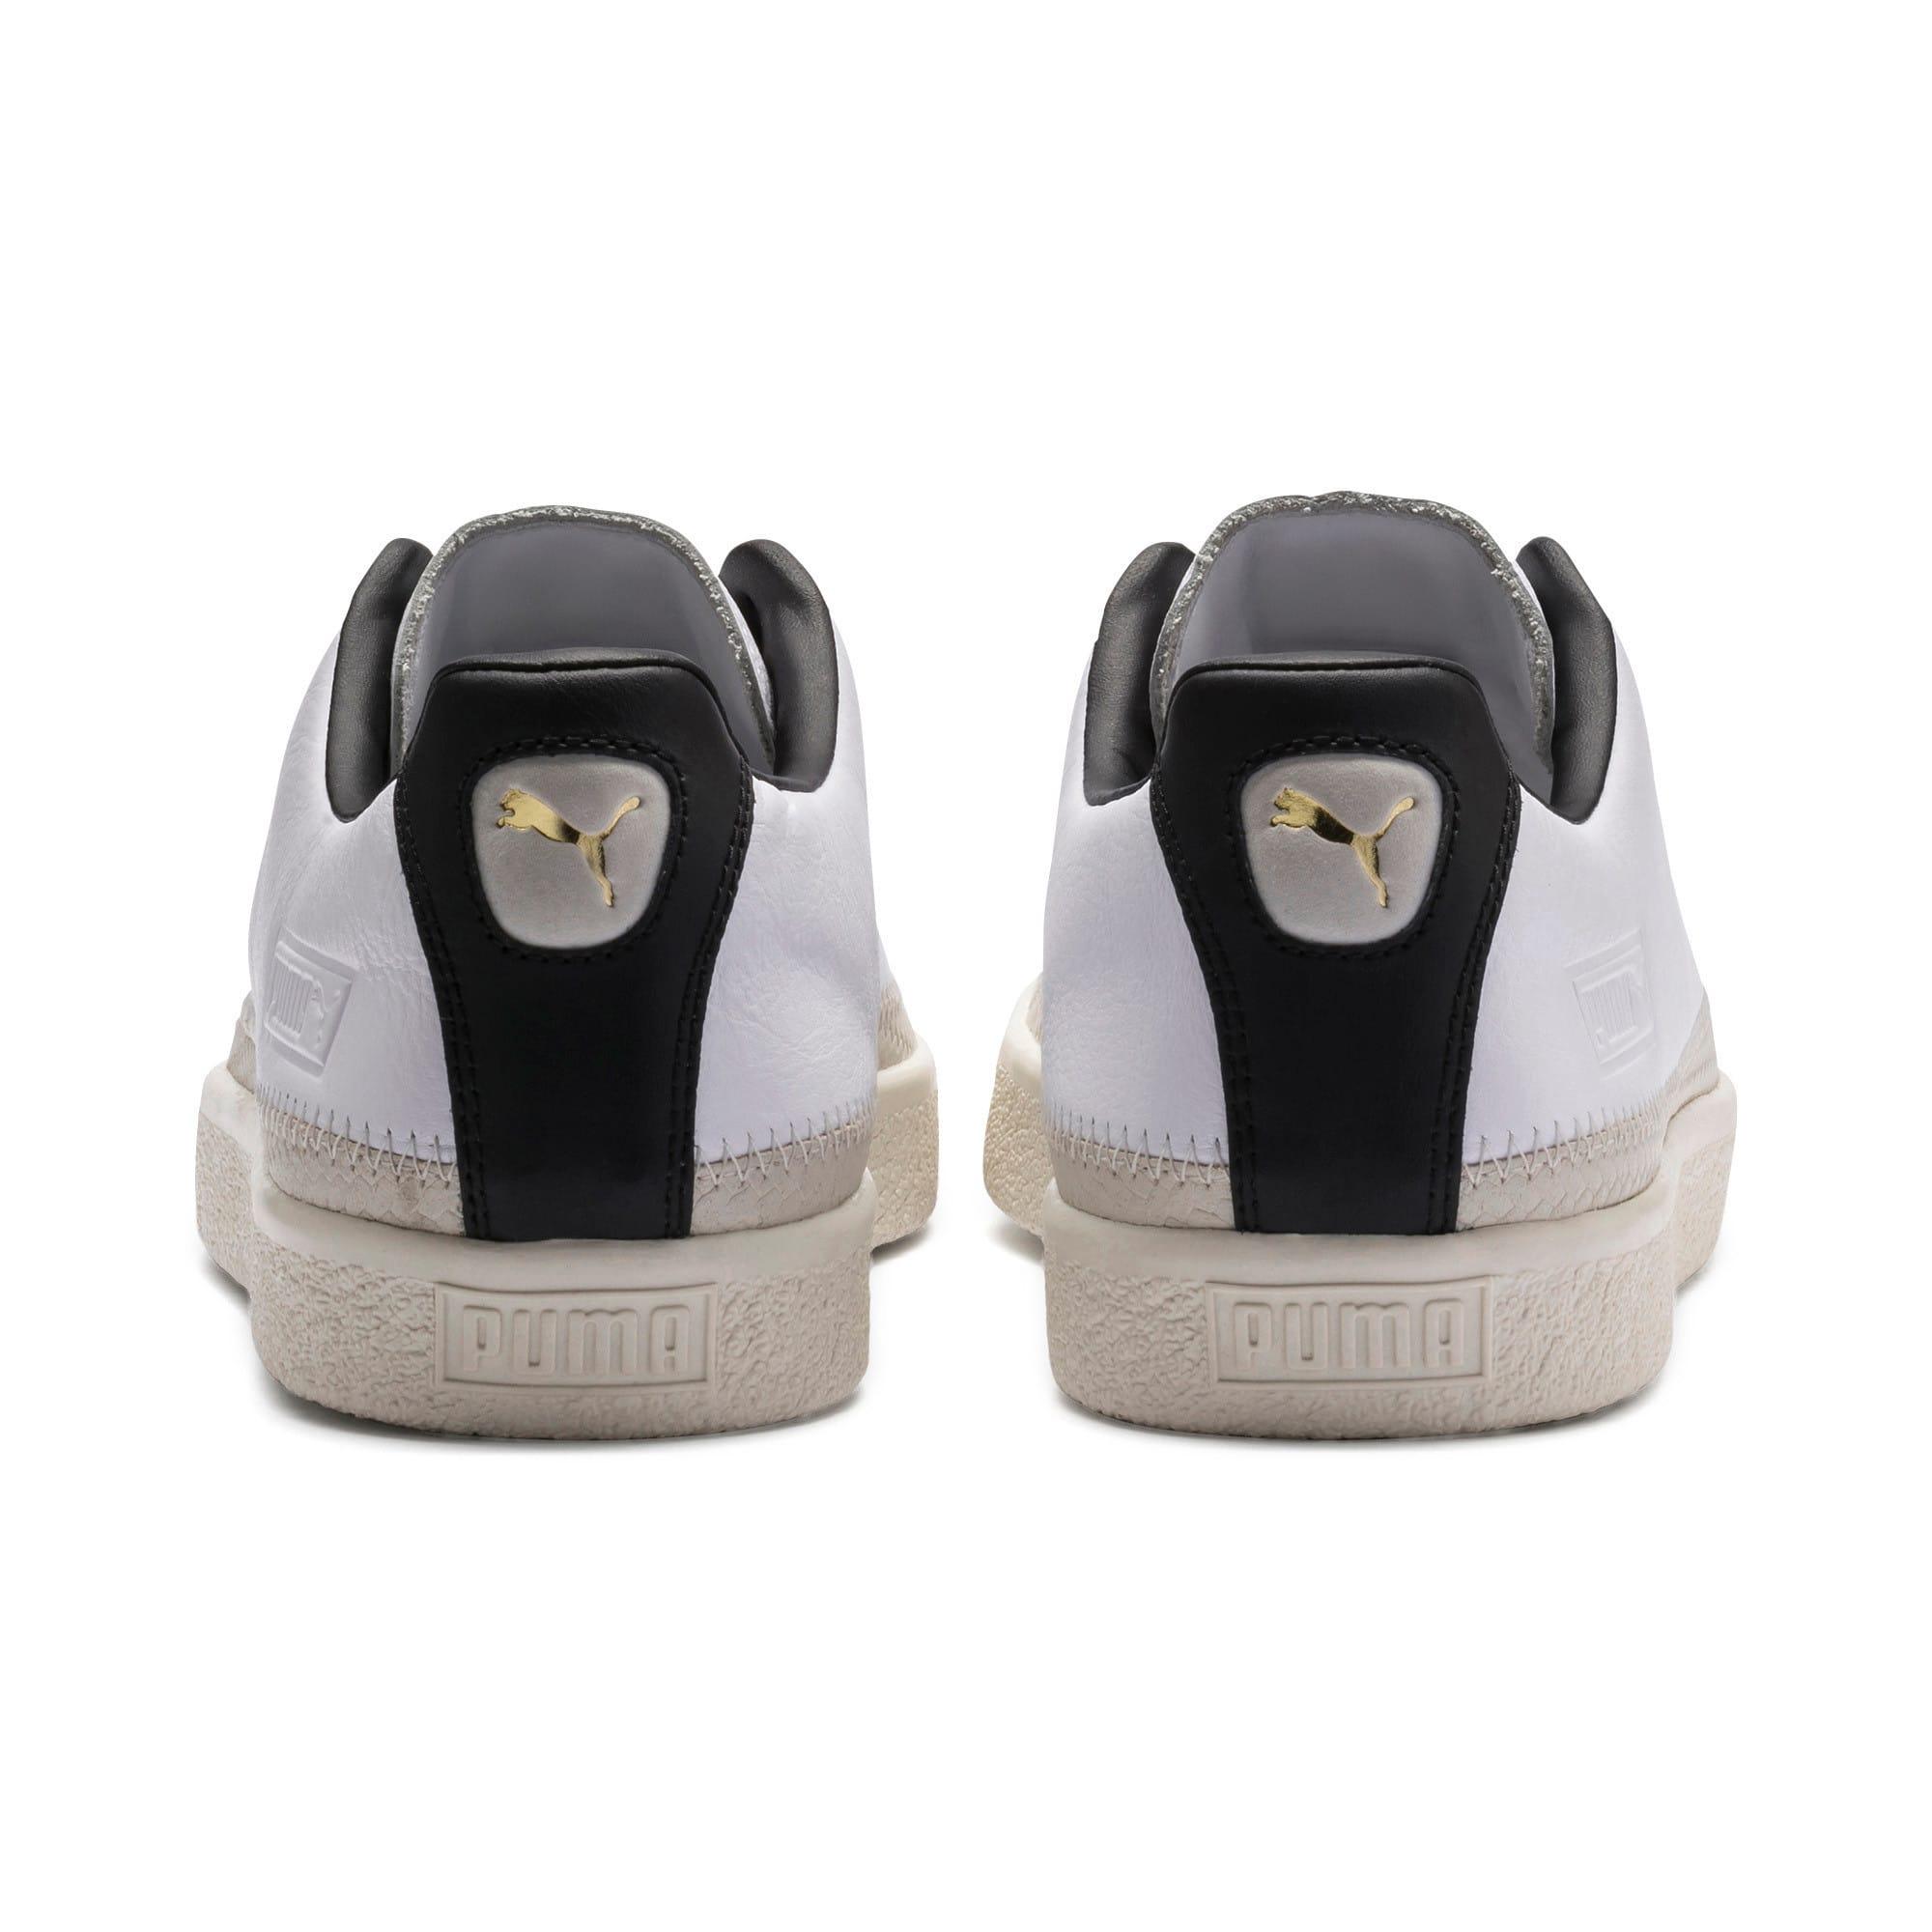 Thumbnail 4 of Basket Trim Shoes, Puma White-Whisper W-Black, medium-IND